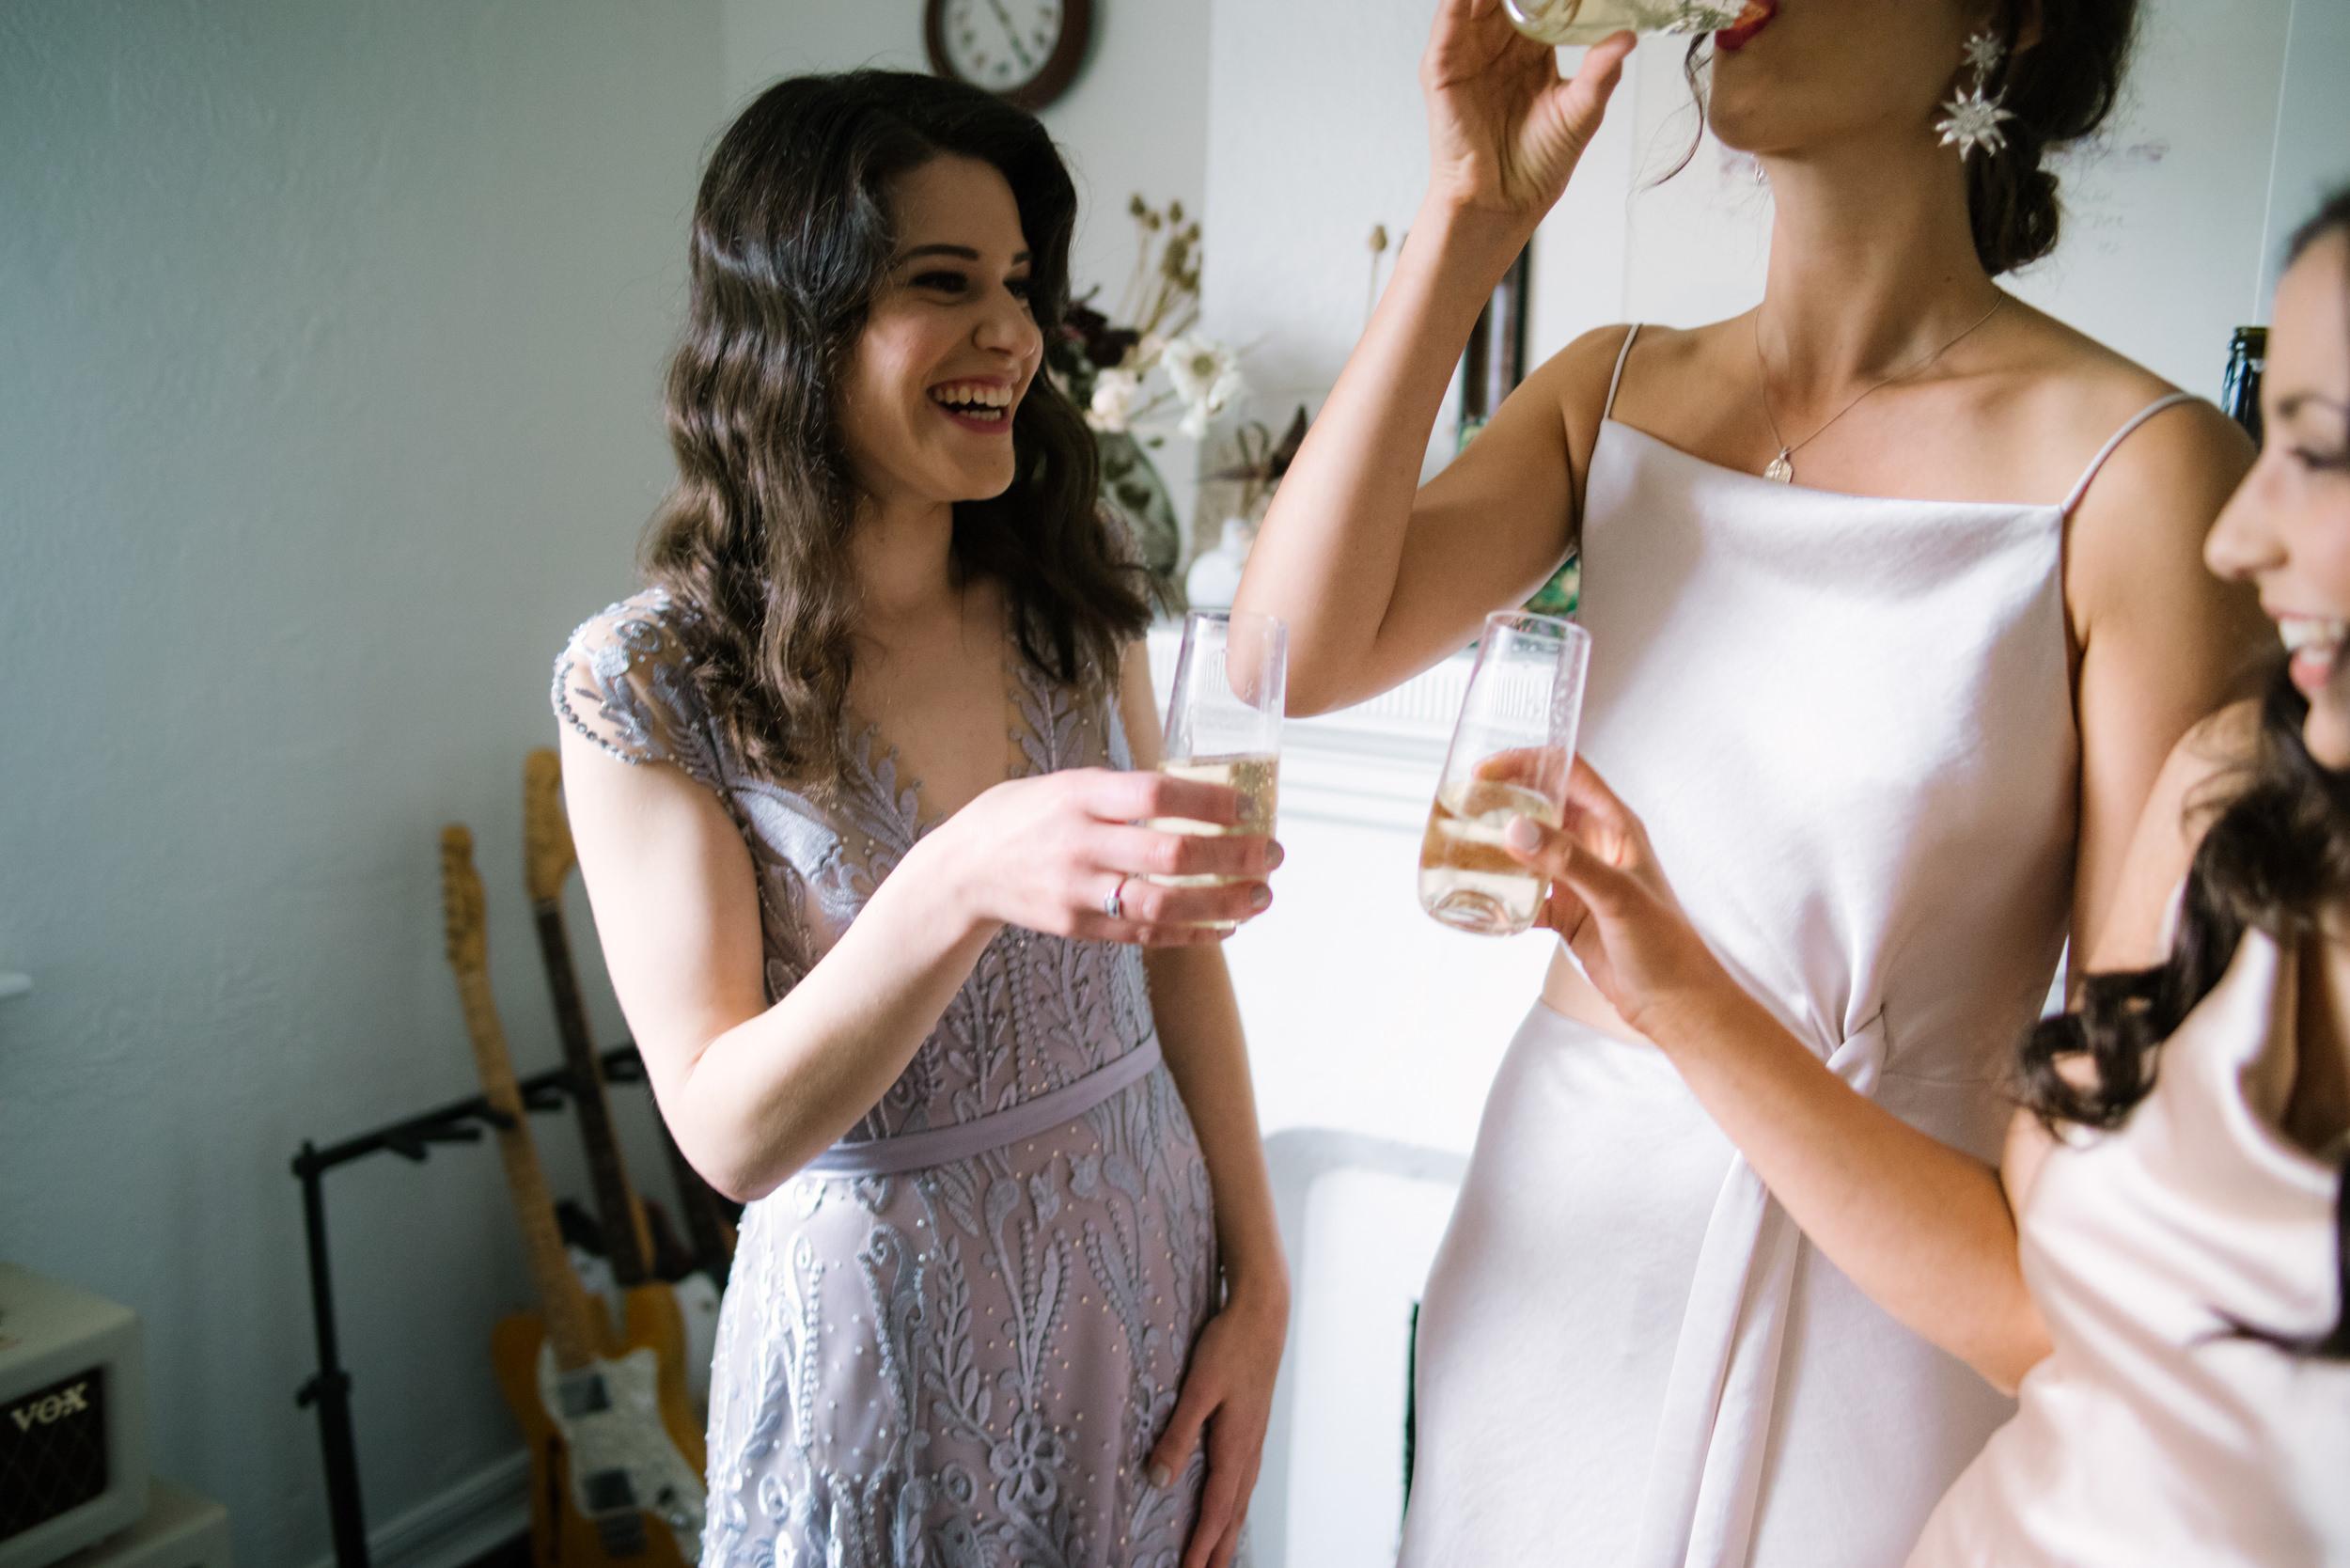 I-Got-You-Babe-&.Co.-Glasshaus-Wedding-Charlotte-Cameron0031.JPG